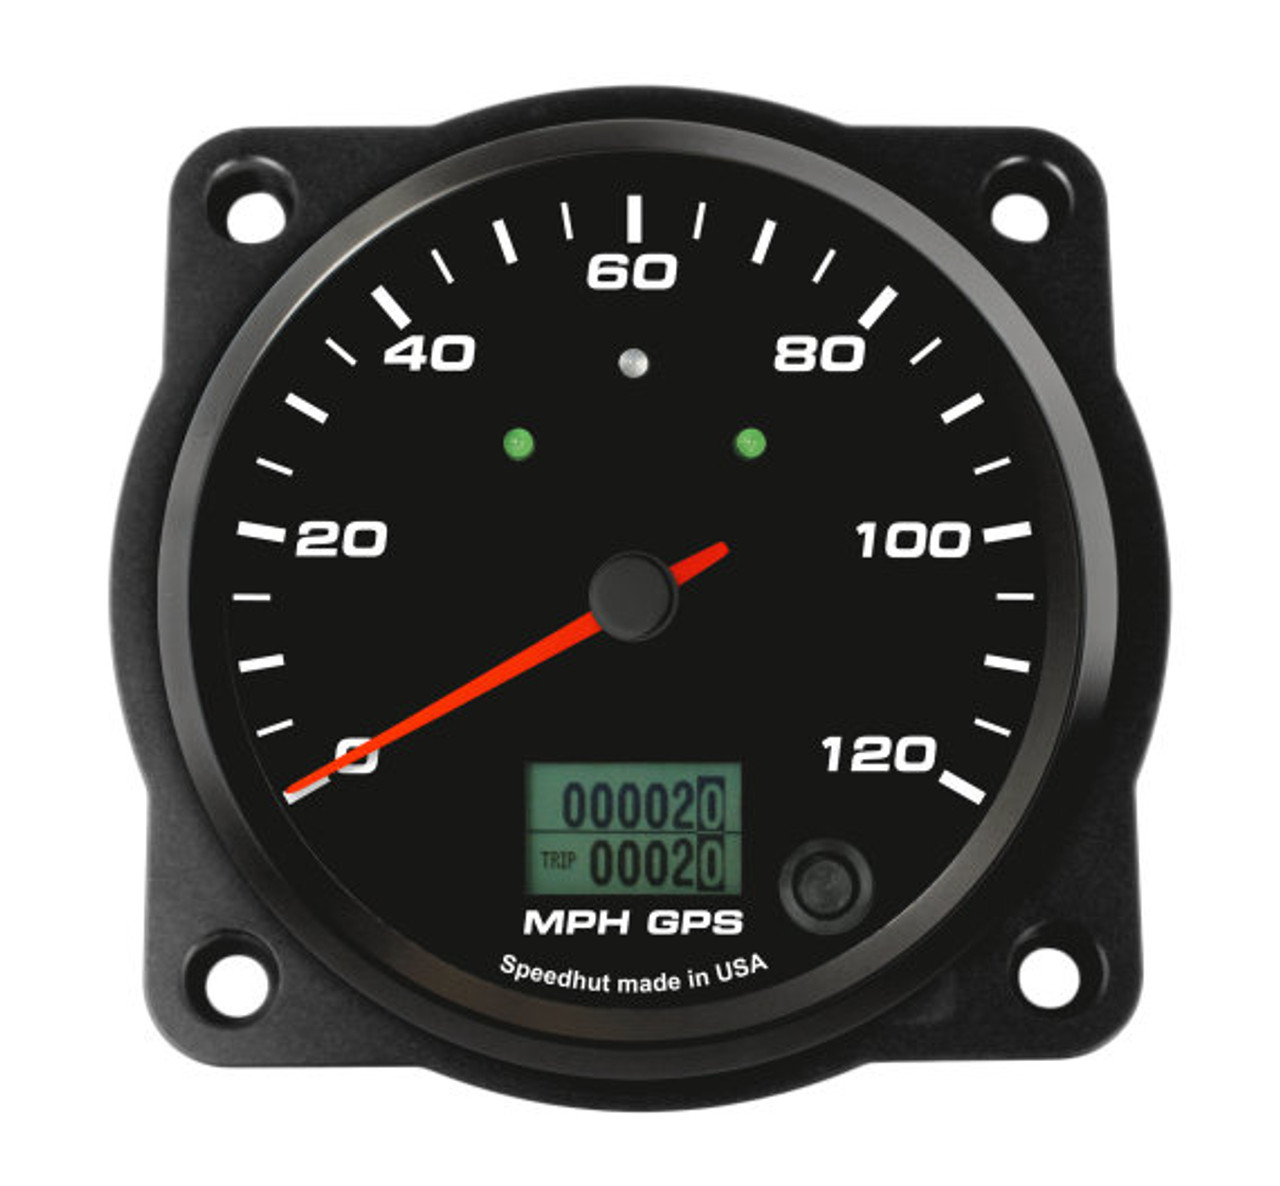 "Black Aviator Trim Bezel for 4-1/2"" gauge"